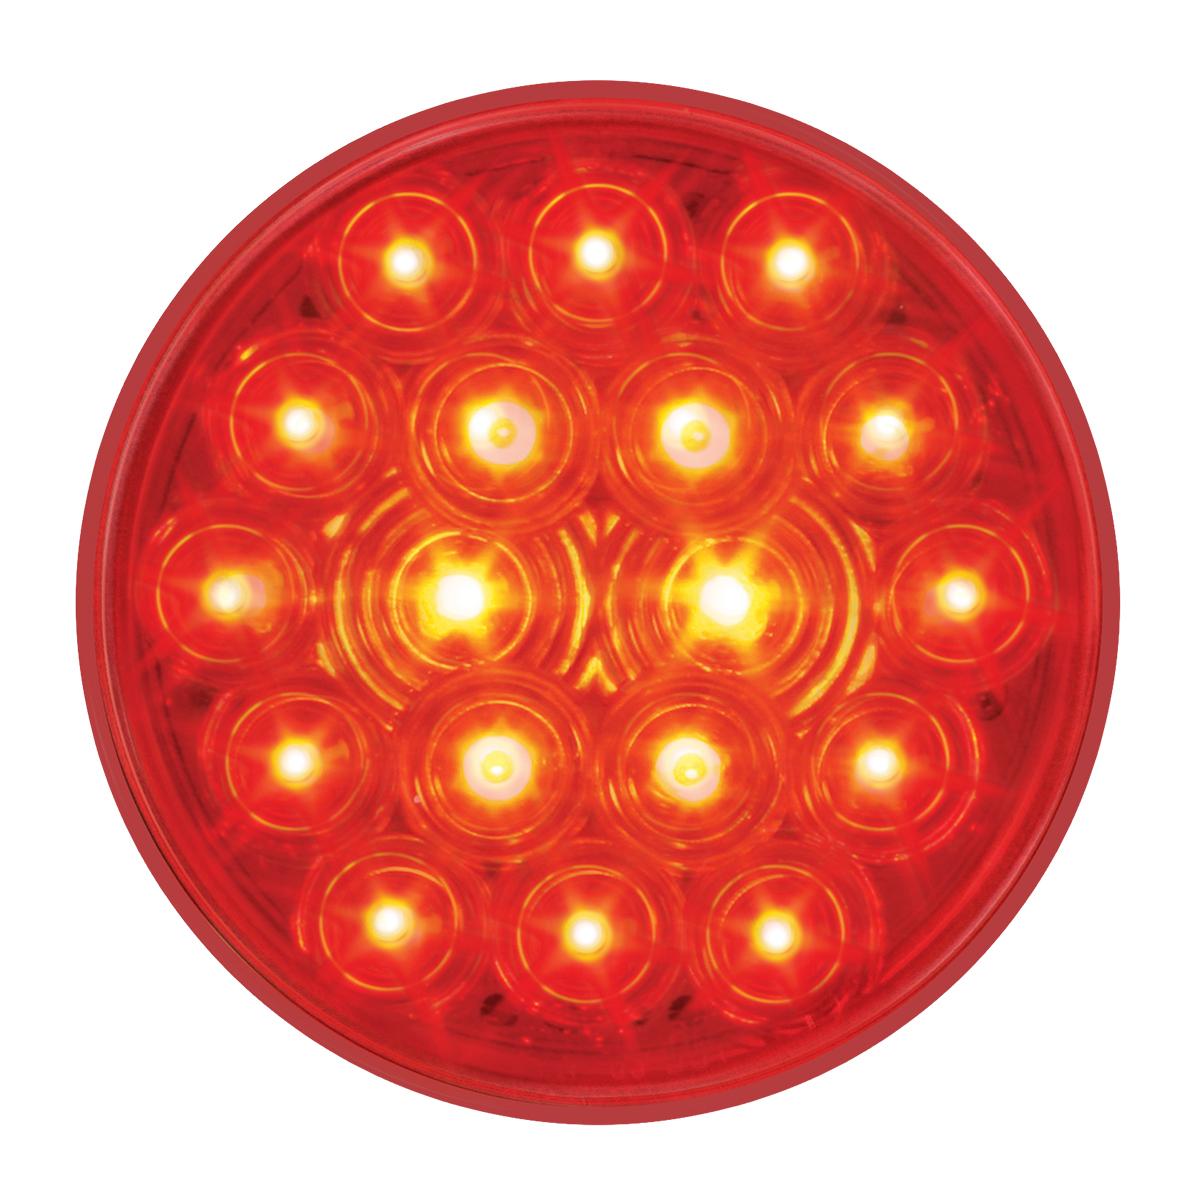 "#76452 4"" Round Fleet LED Flat Red/Red Light"